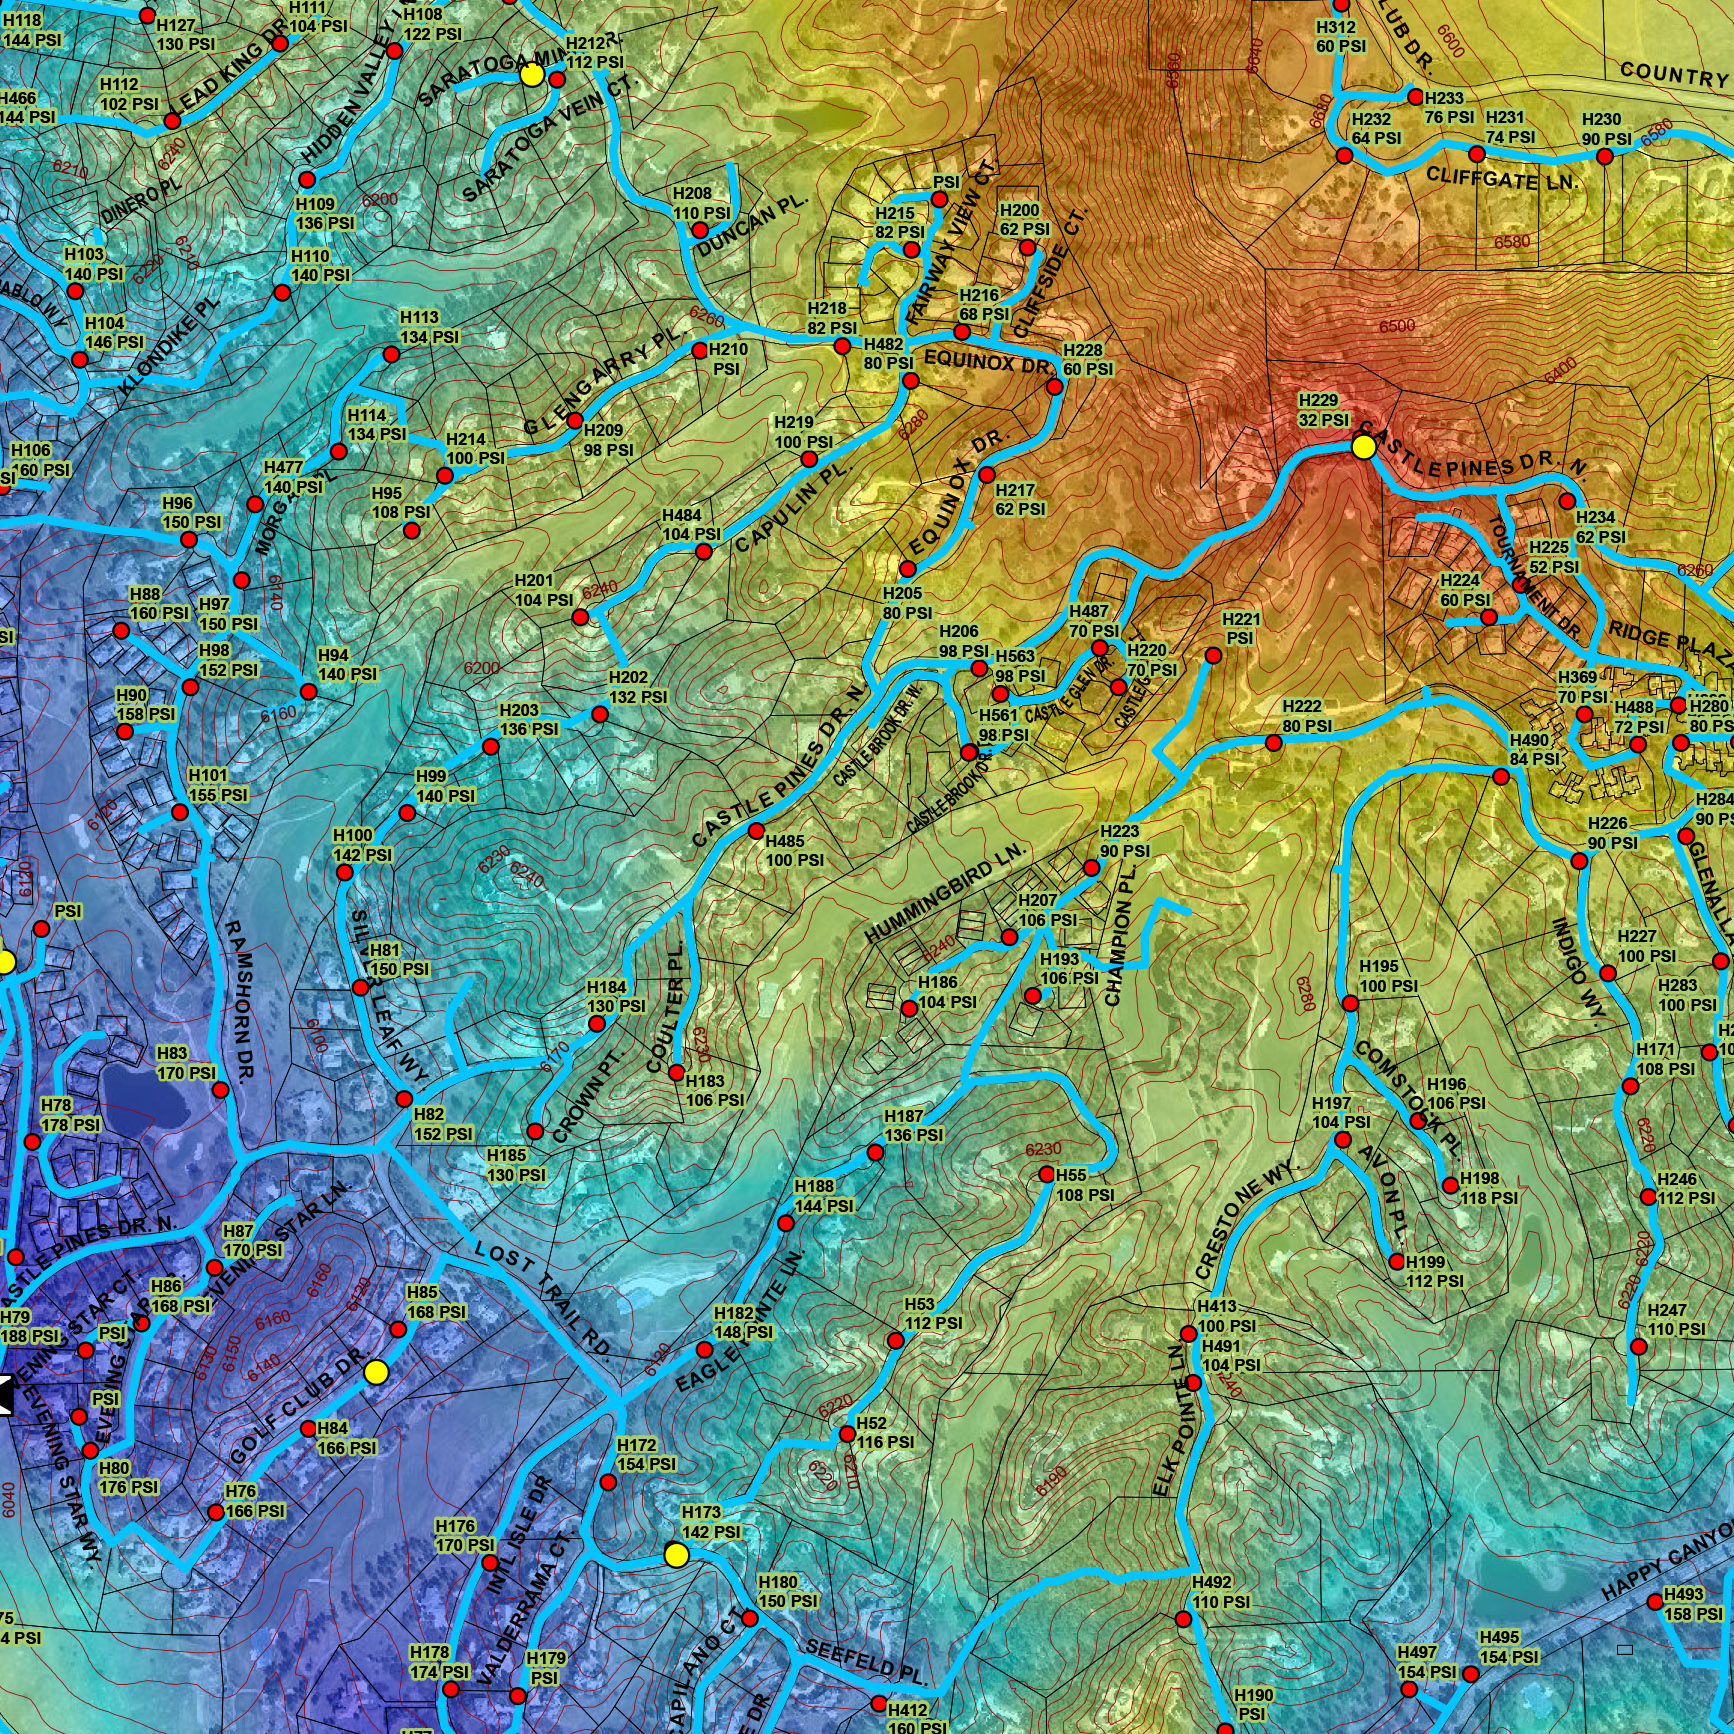 ArcGIS WATER PRESSURE MAP